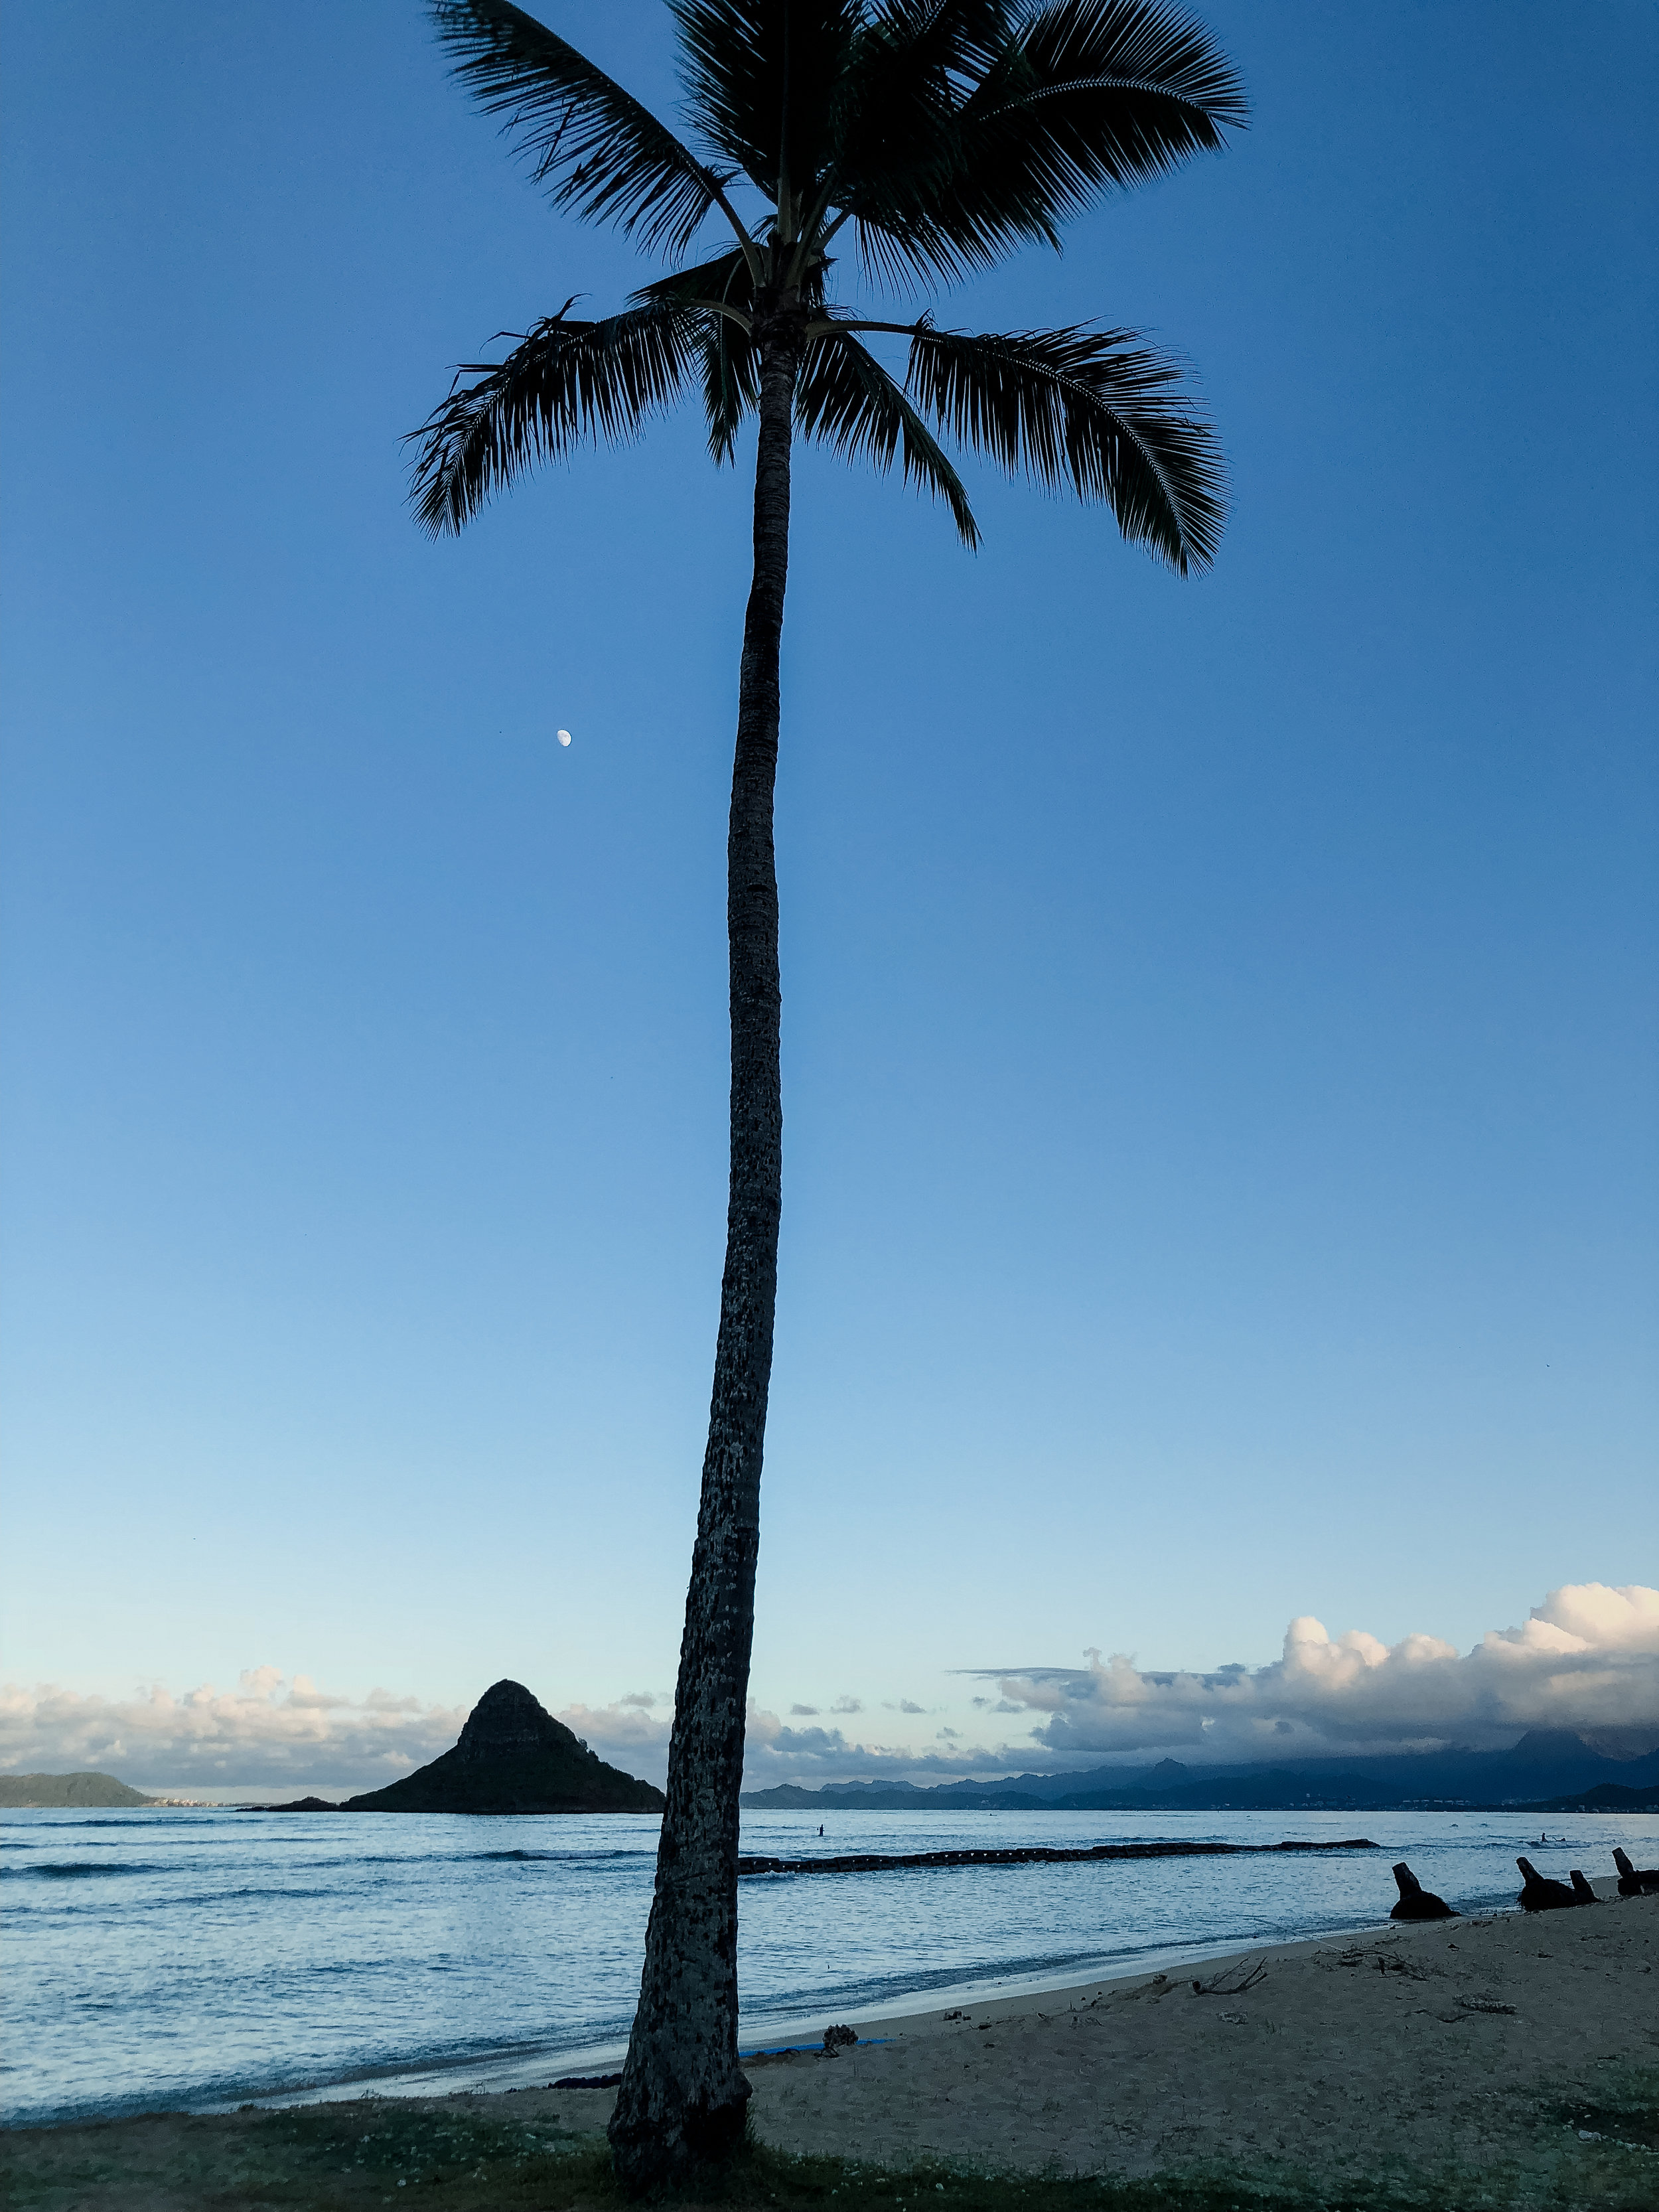 meagans hawaii pics-46.jpg